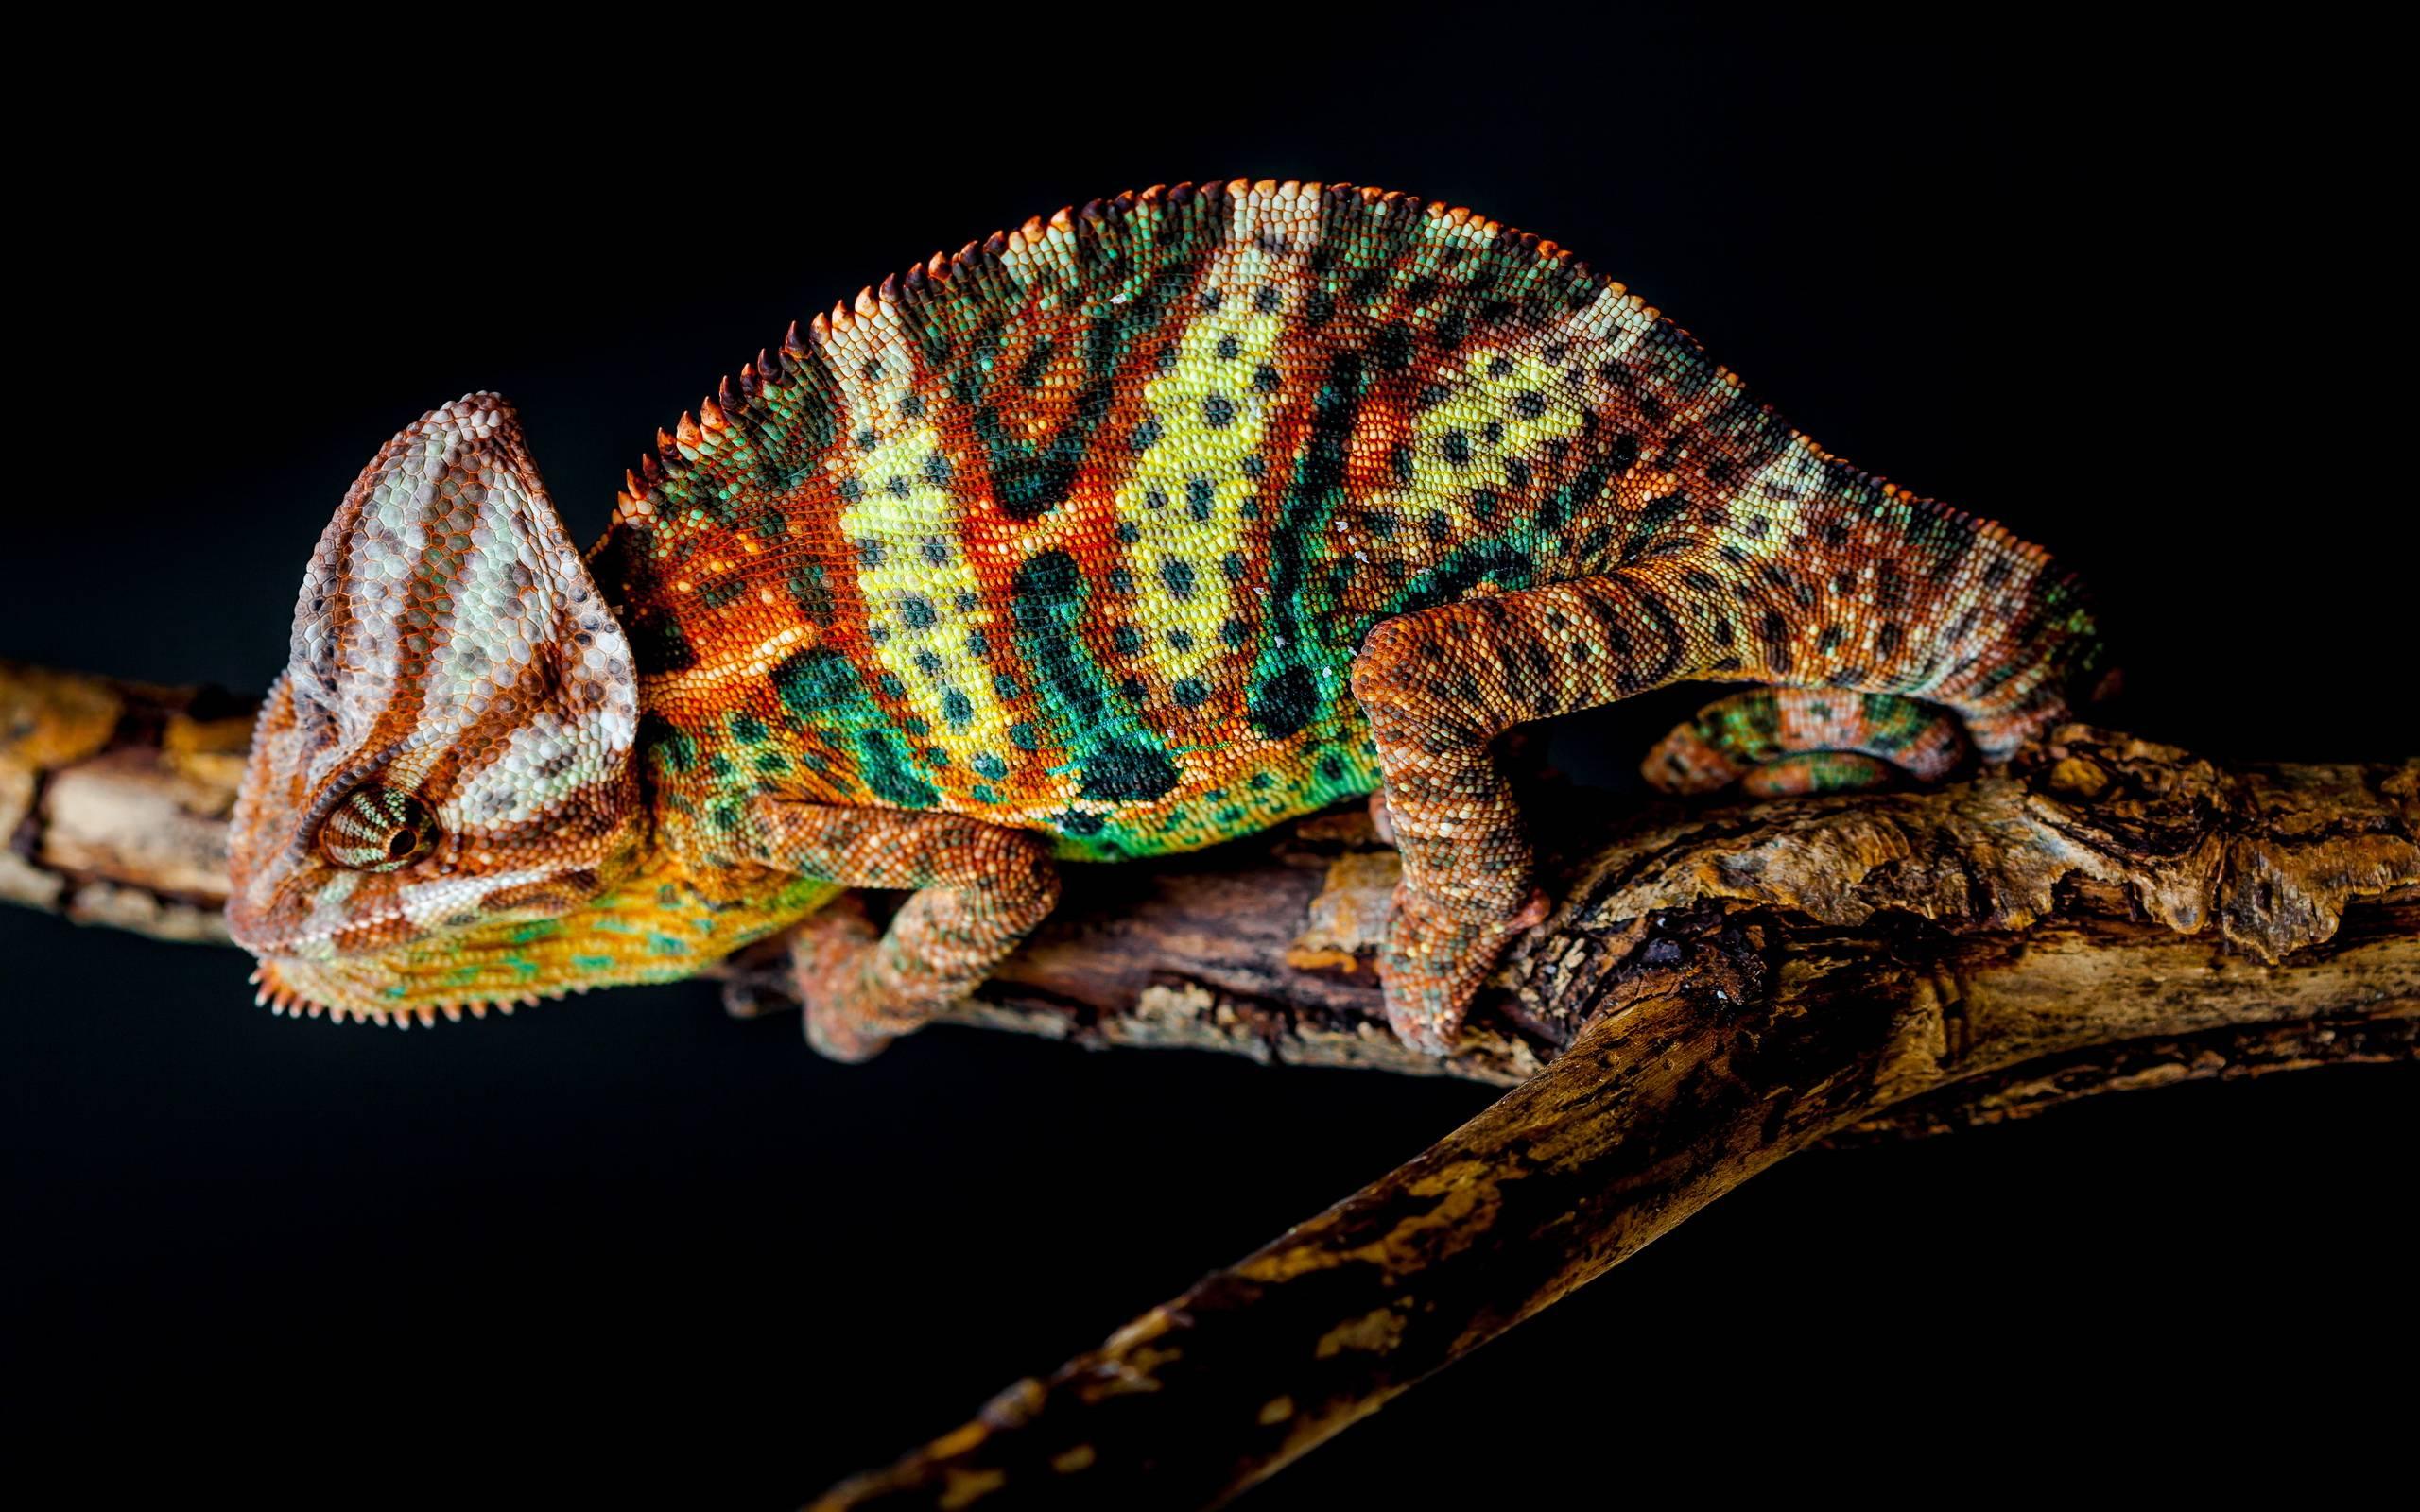 striped chameleon wallpaper hd - photo #21